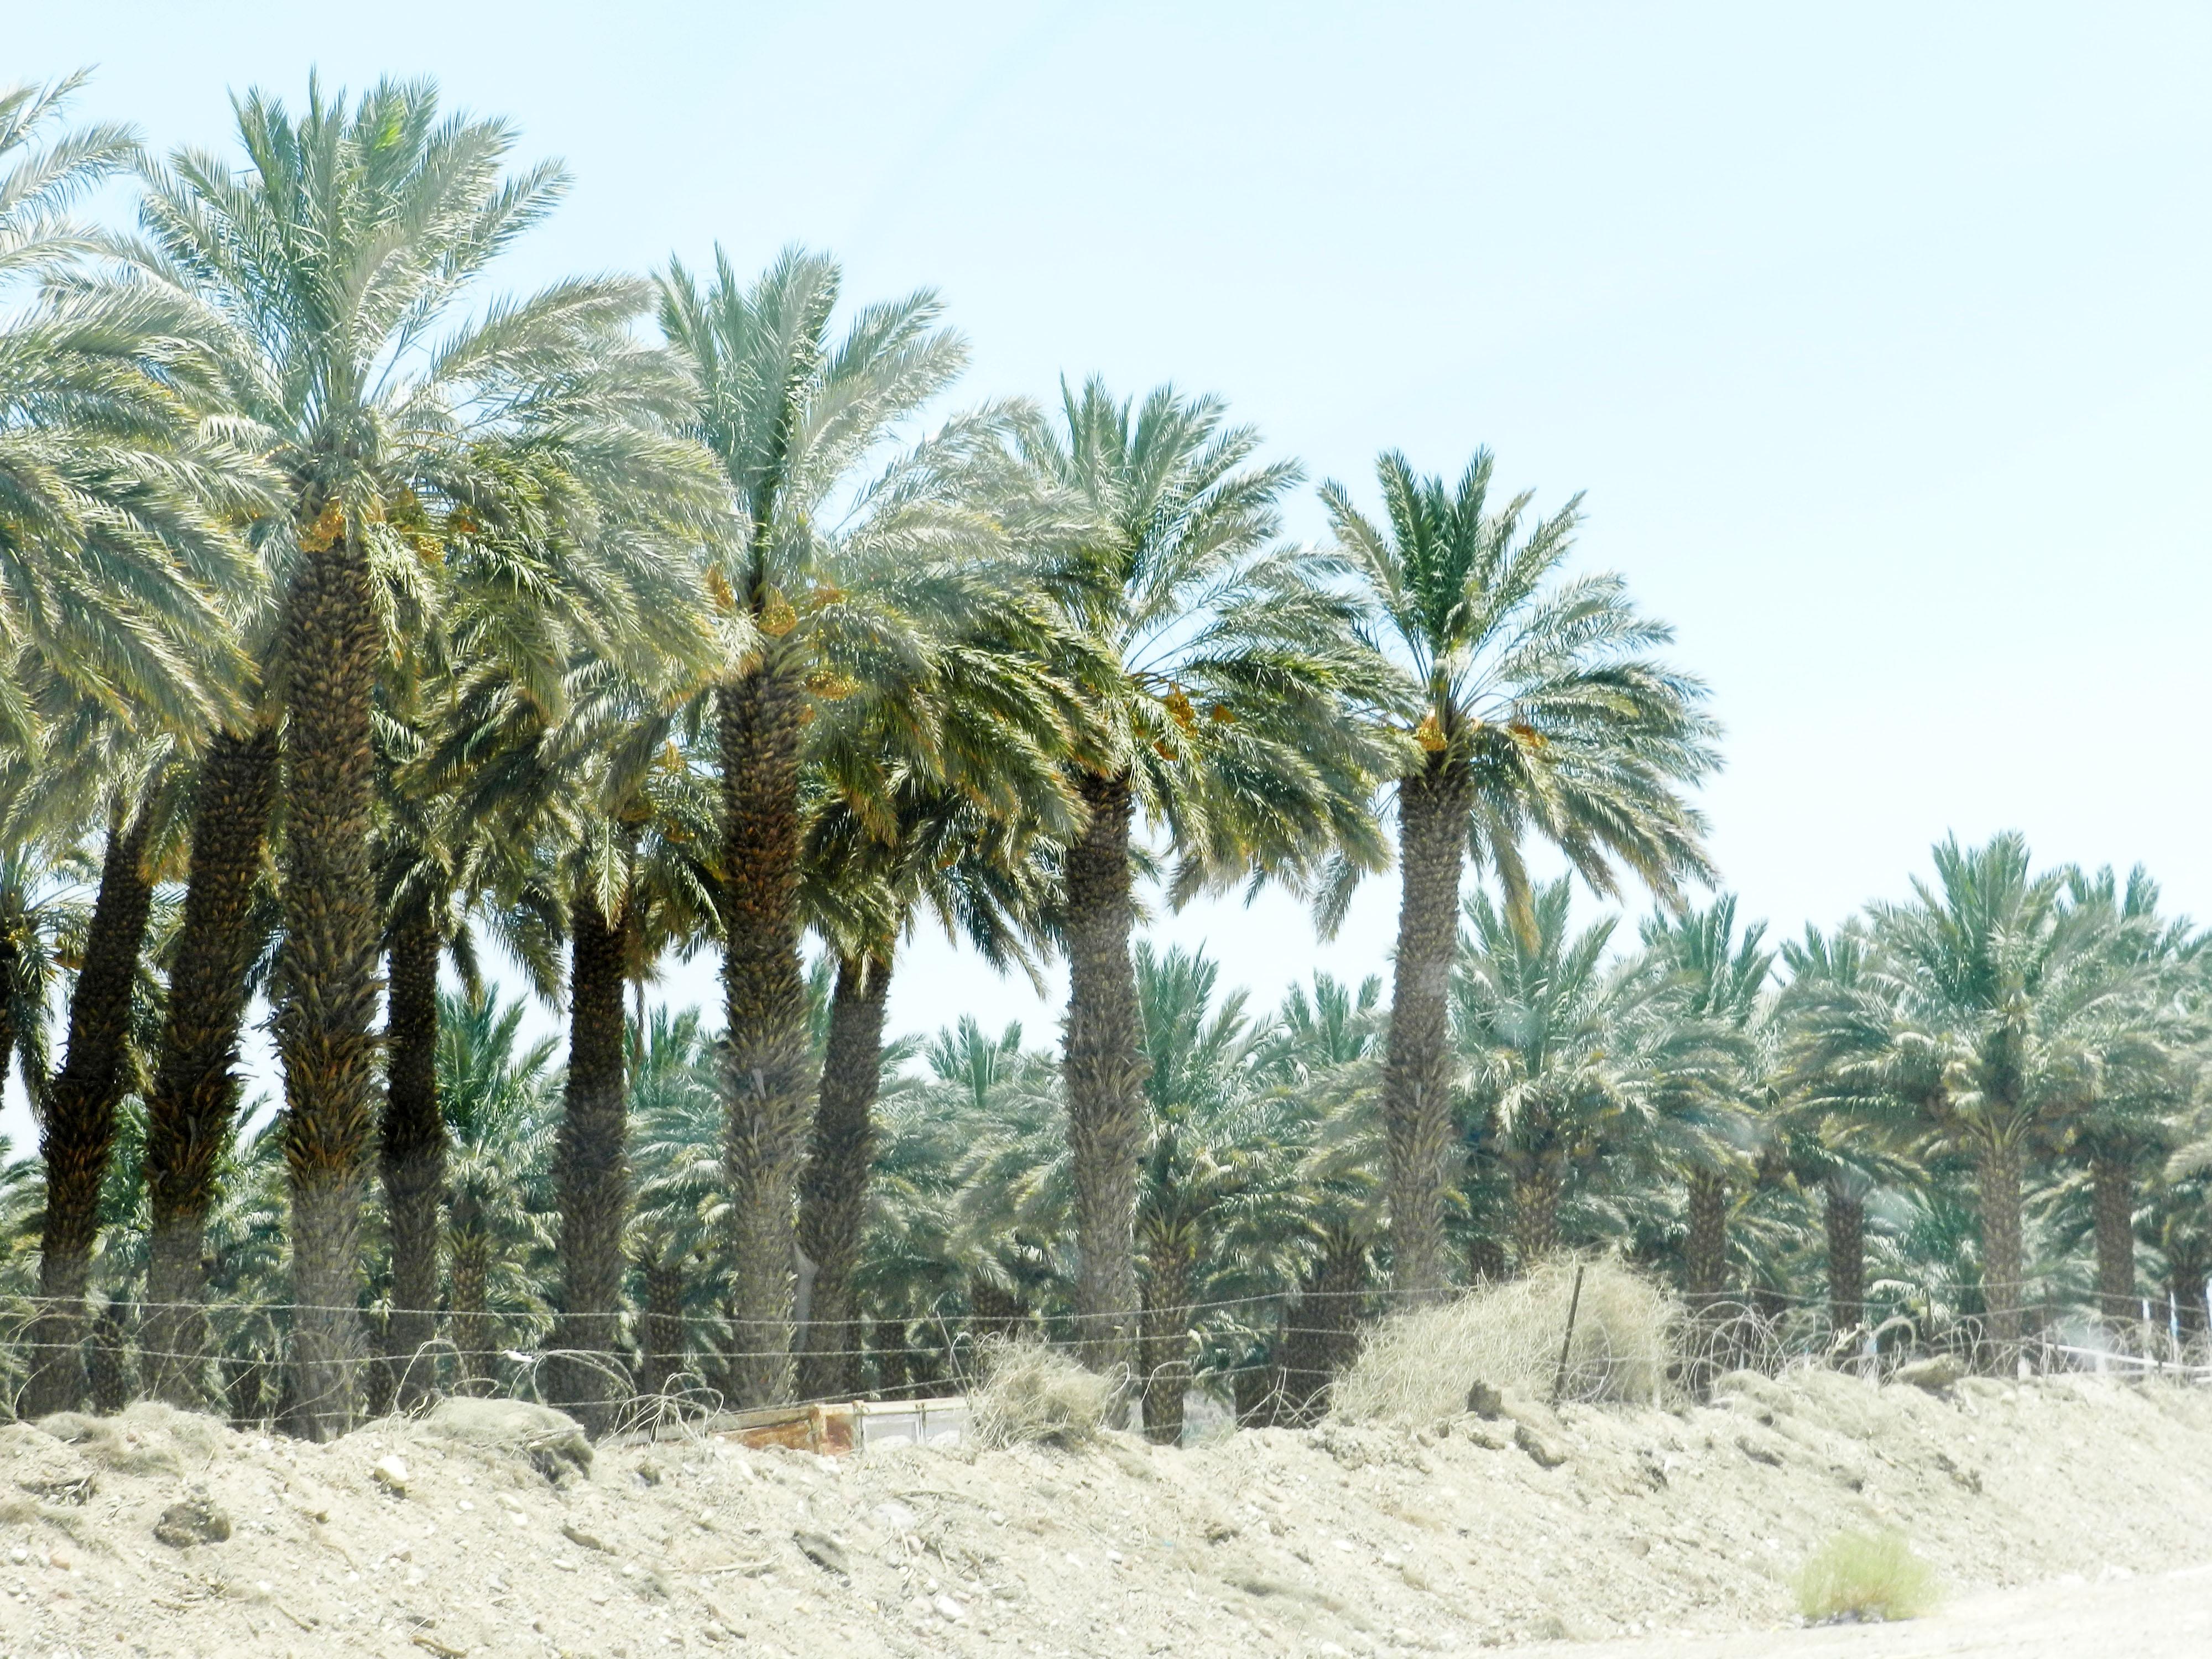 Arava, Negev Desert, Israel